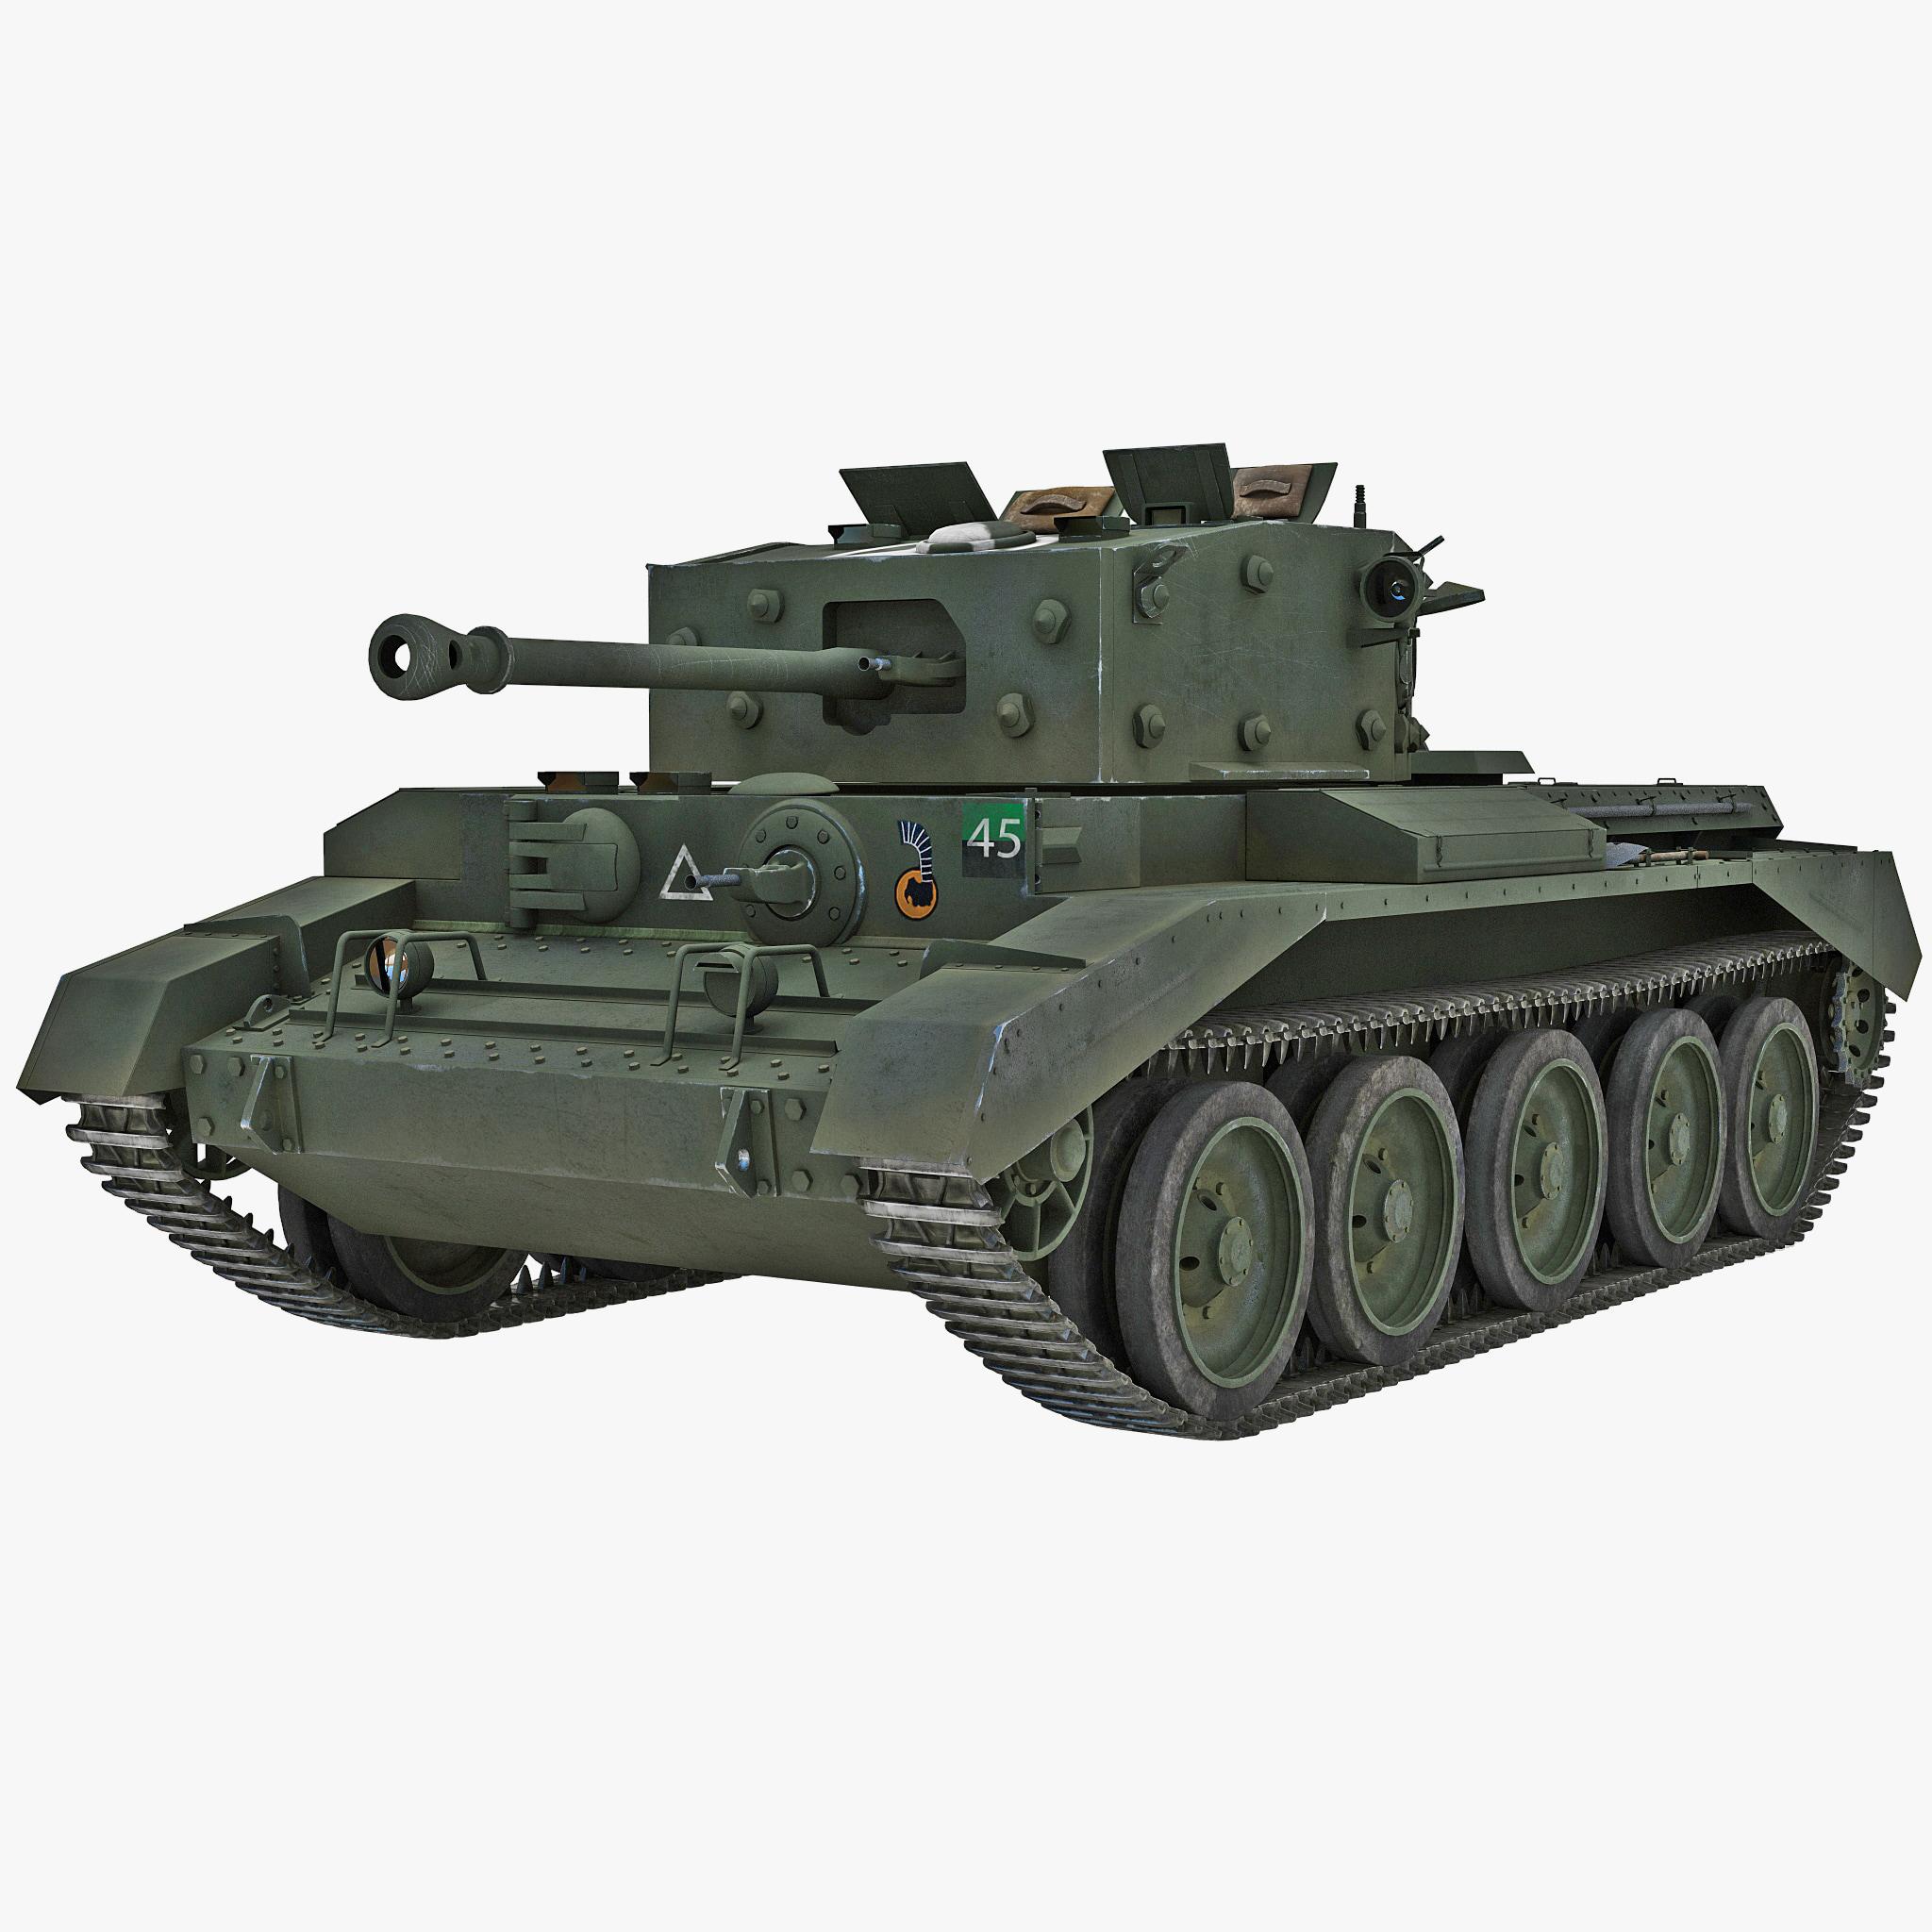 Britain Cruiser WWII Tank Mk VIII Cromwell Green_1.jpg